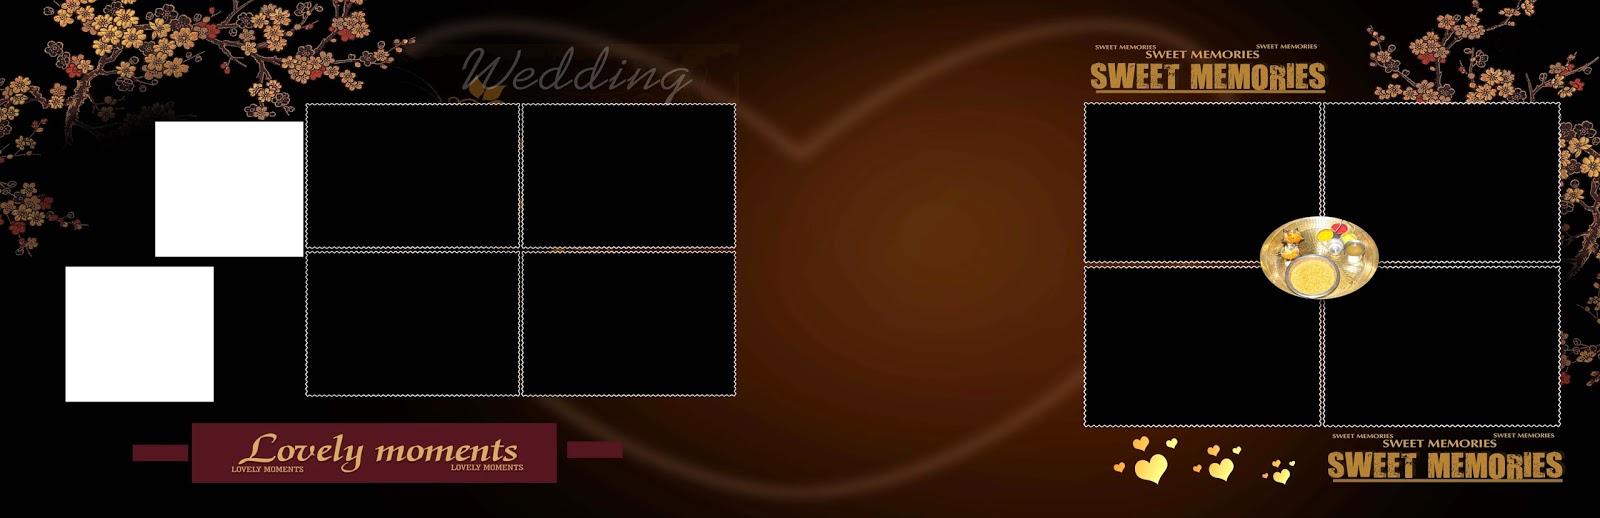 40 New 12x36 Karizma Wedding Album Backgrounds Psd Files Free